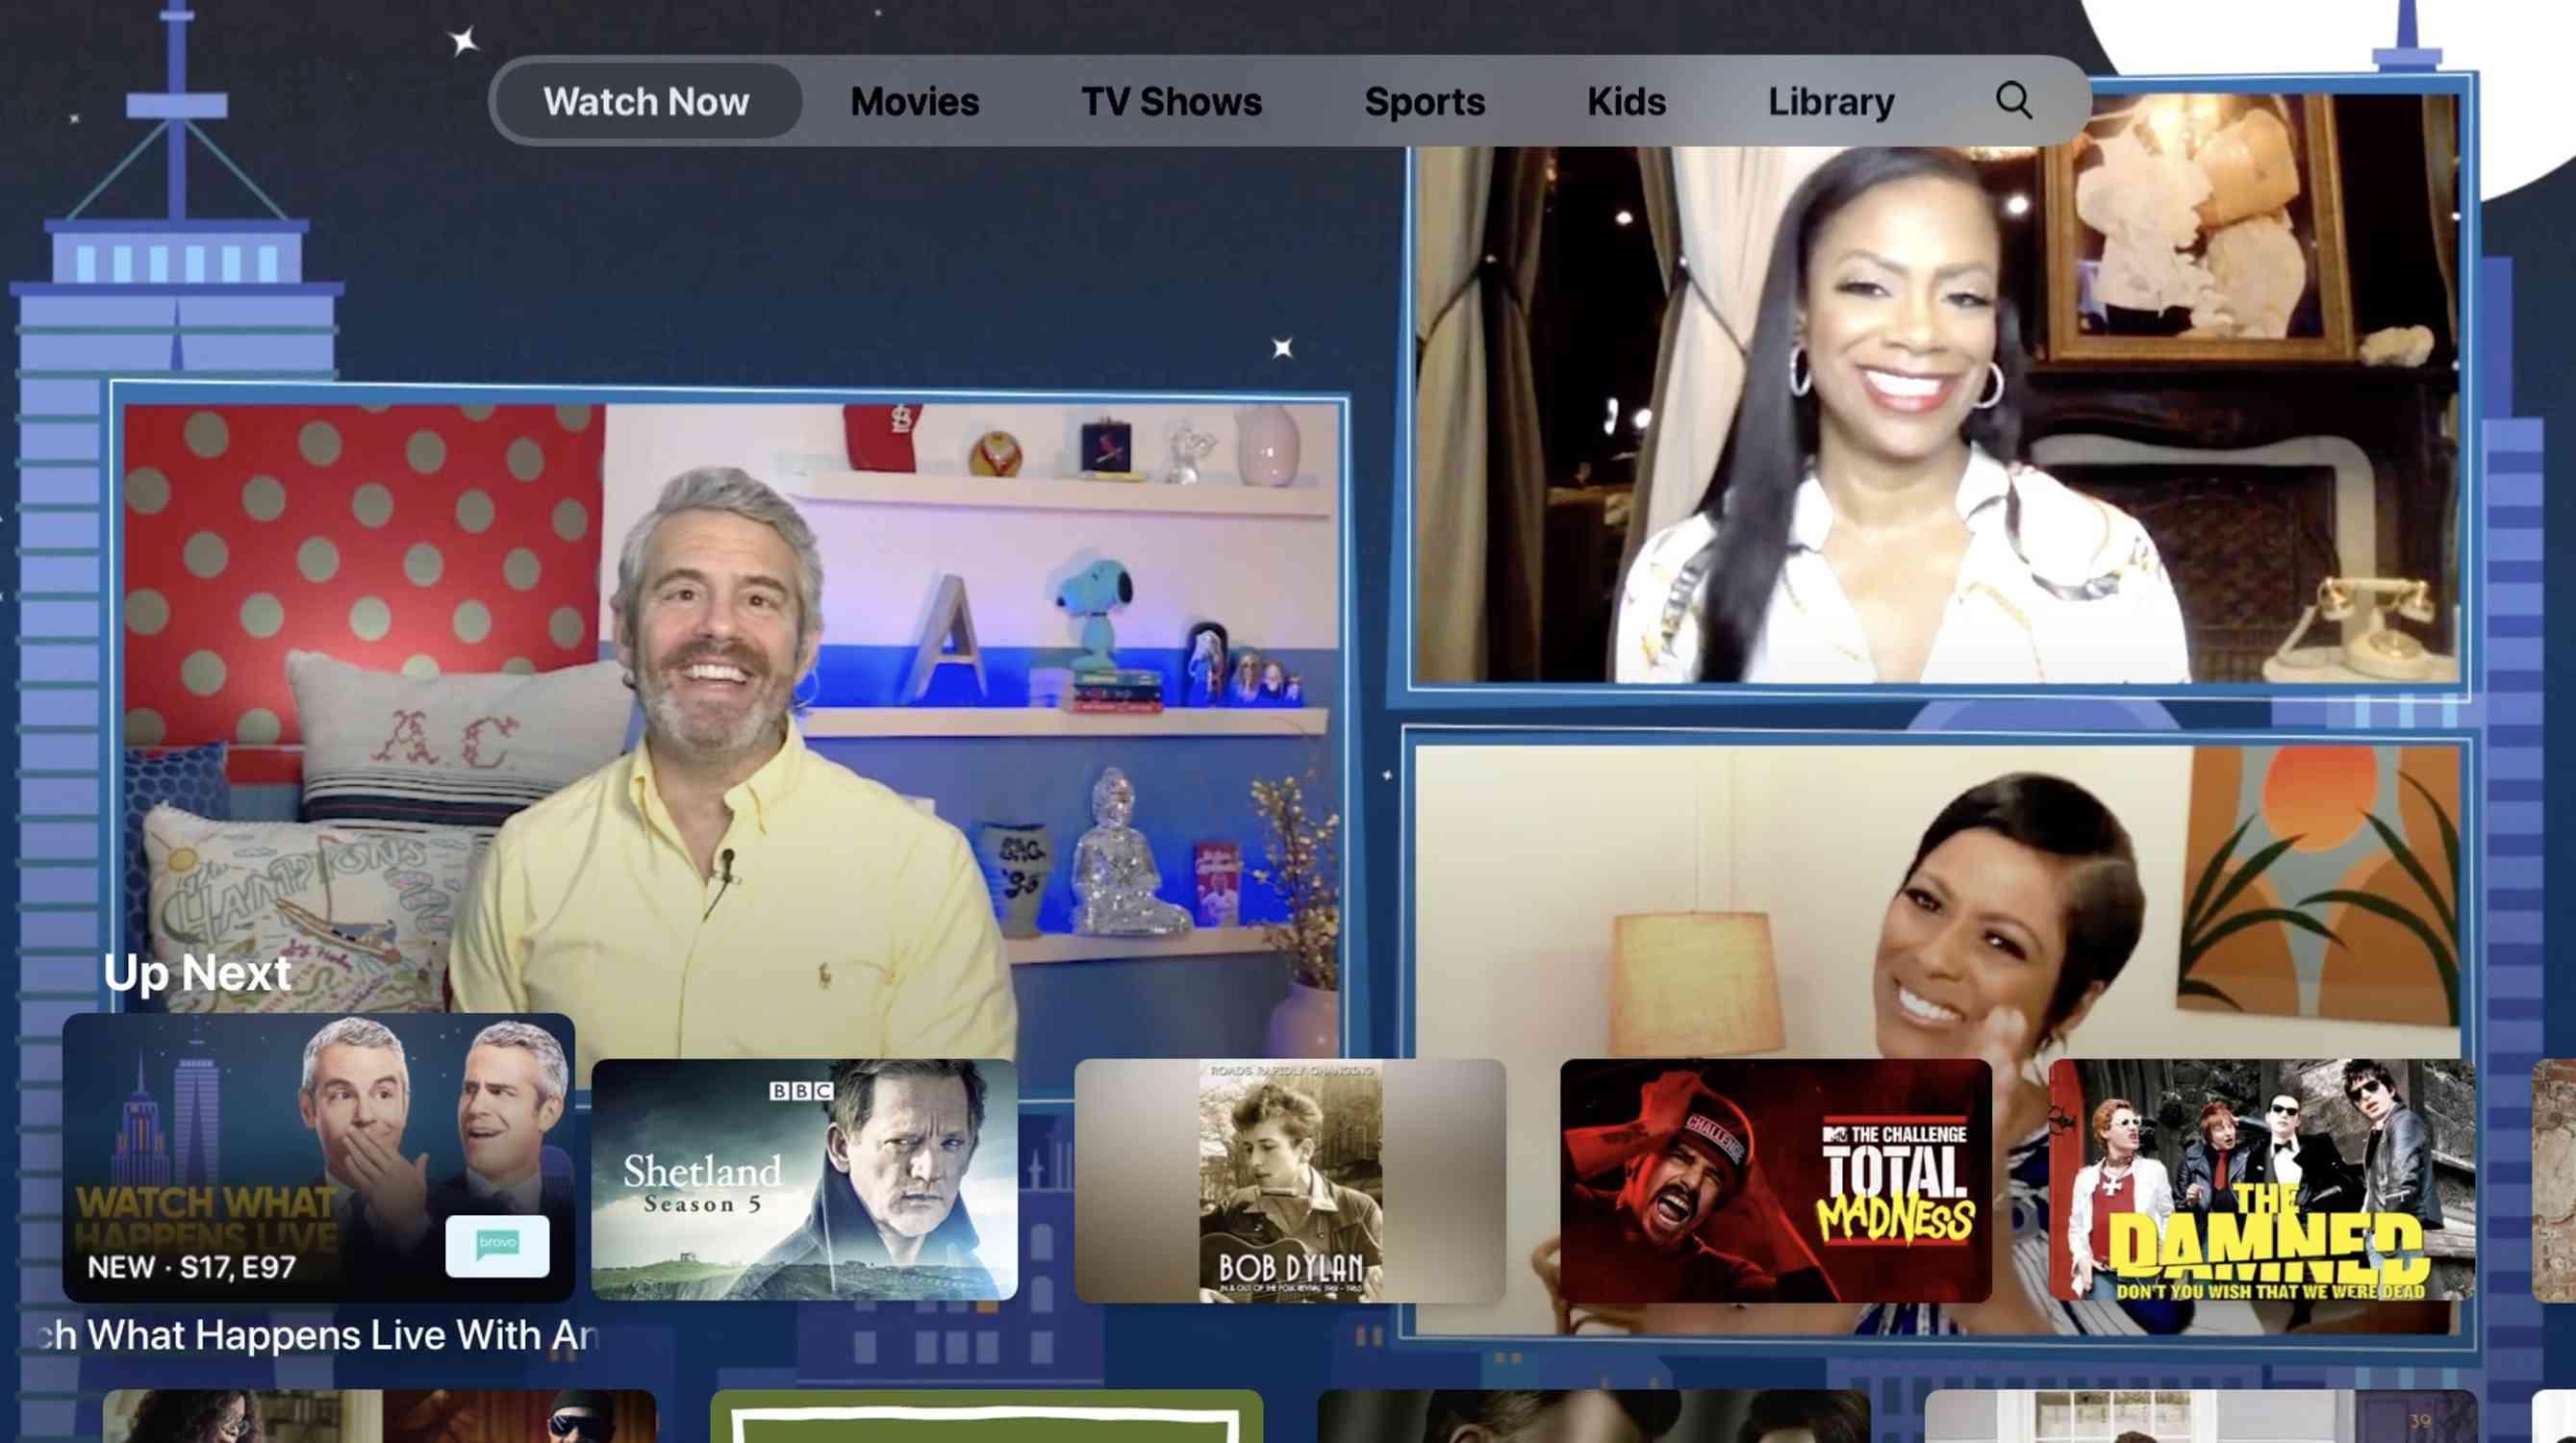 Screenshot of Apple TV app homescreen